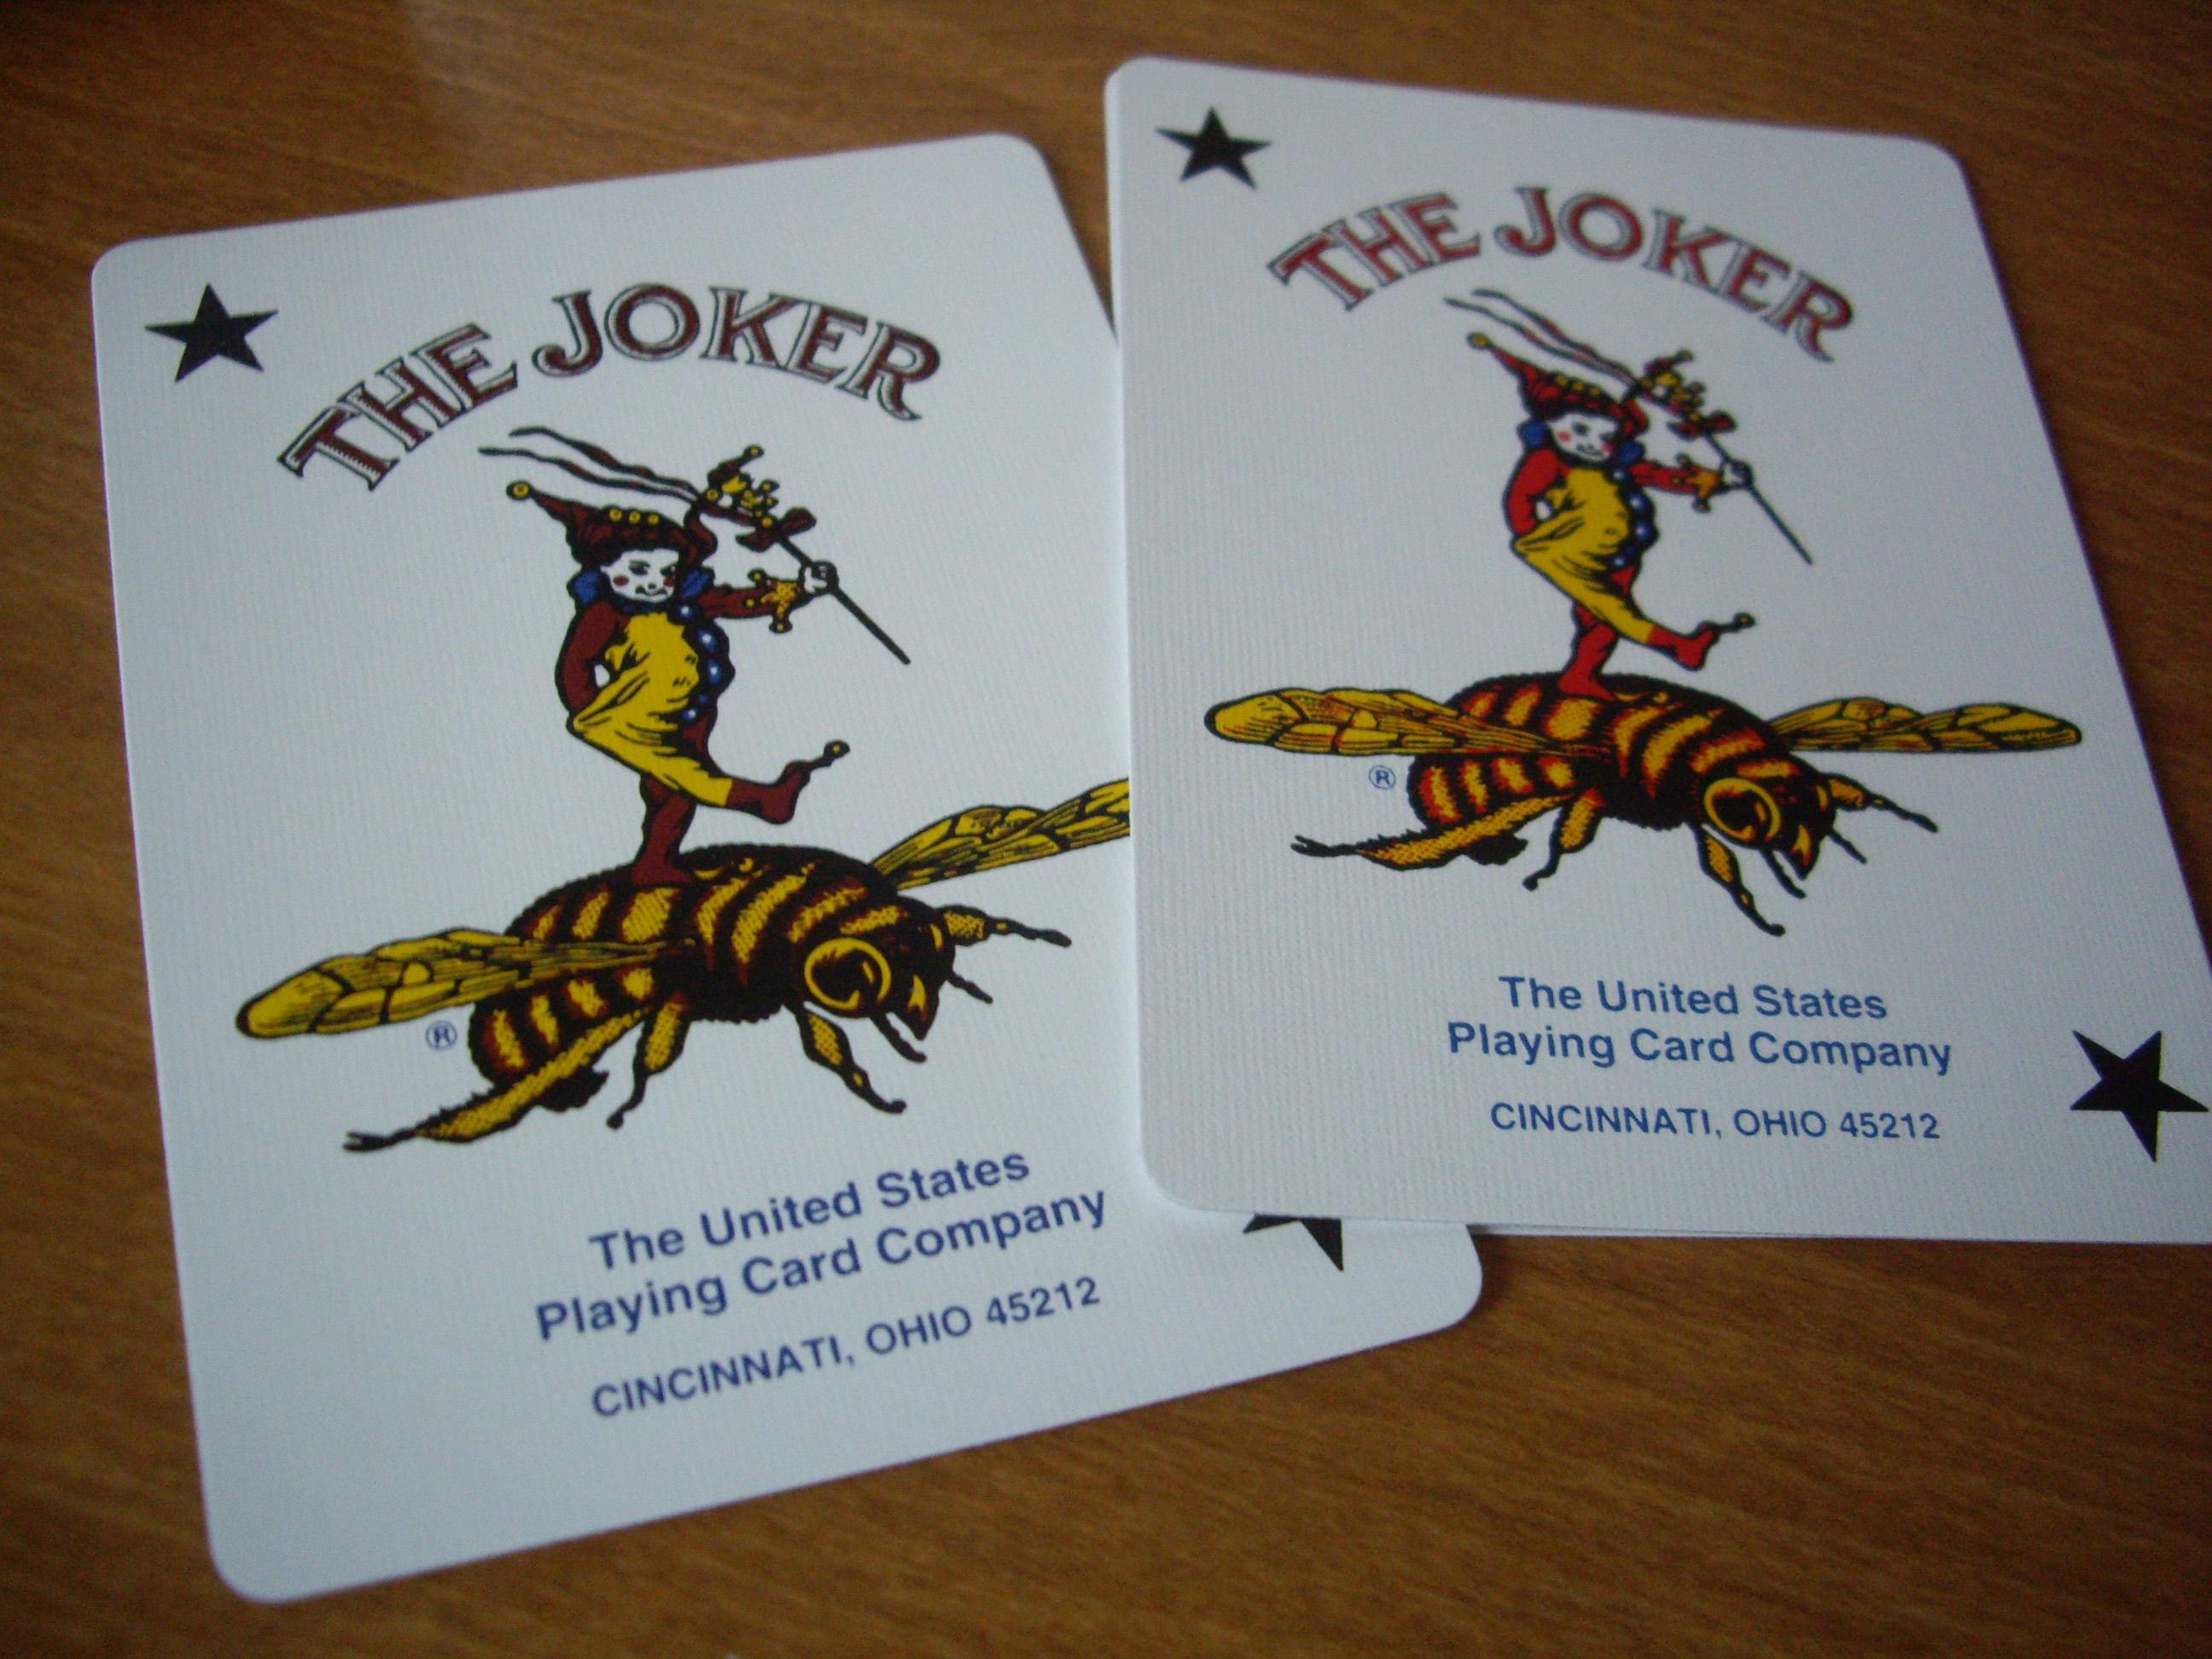 Wynn : Compare the Jokers. Wynn on left.